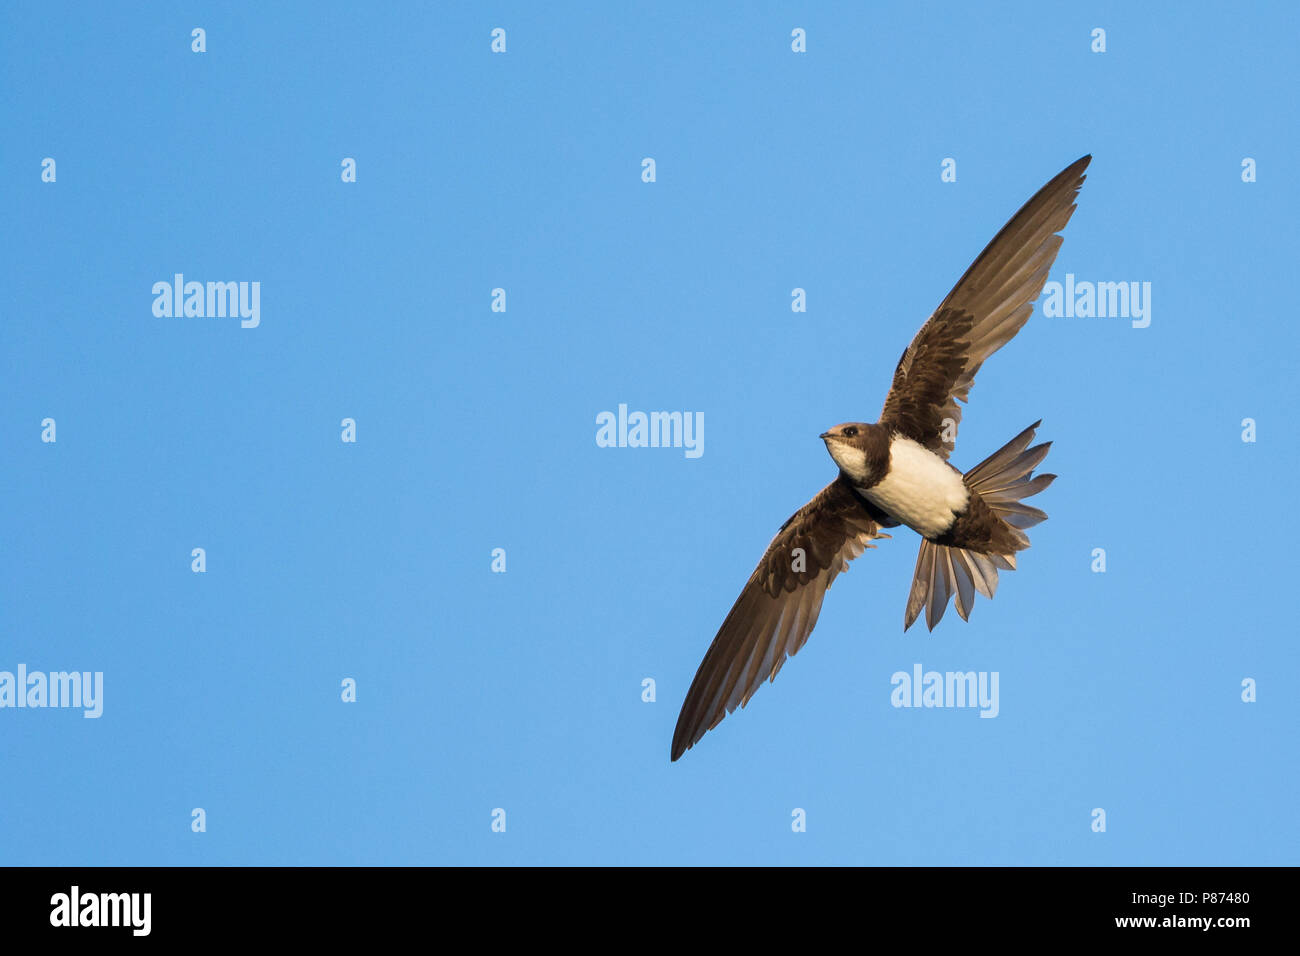 Alpine Swift - Alpensegler - Tachymarptis melba ssp. melba, Germany, adult Stock Photo